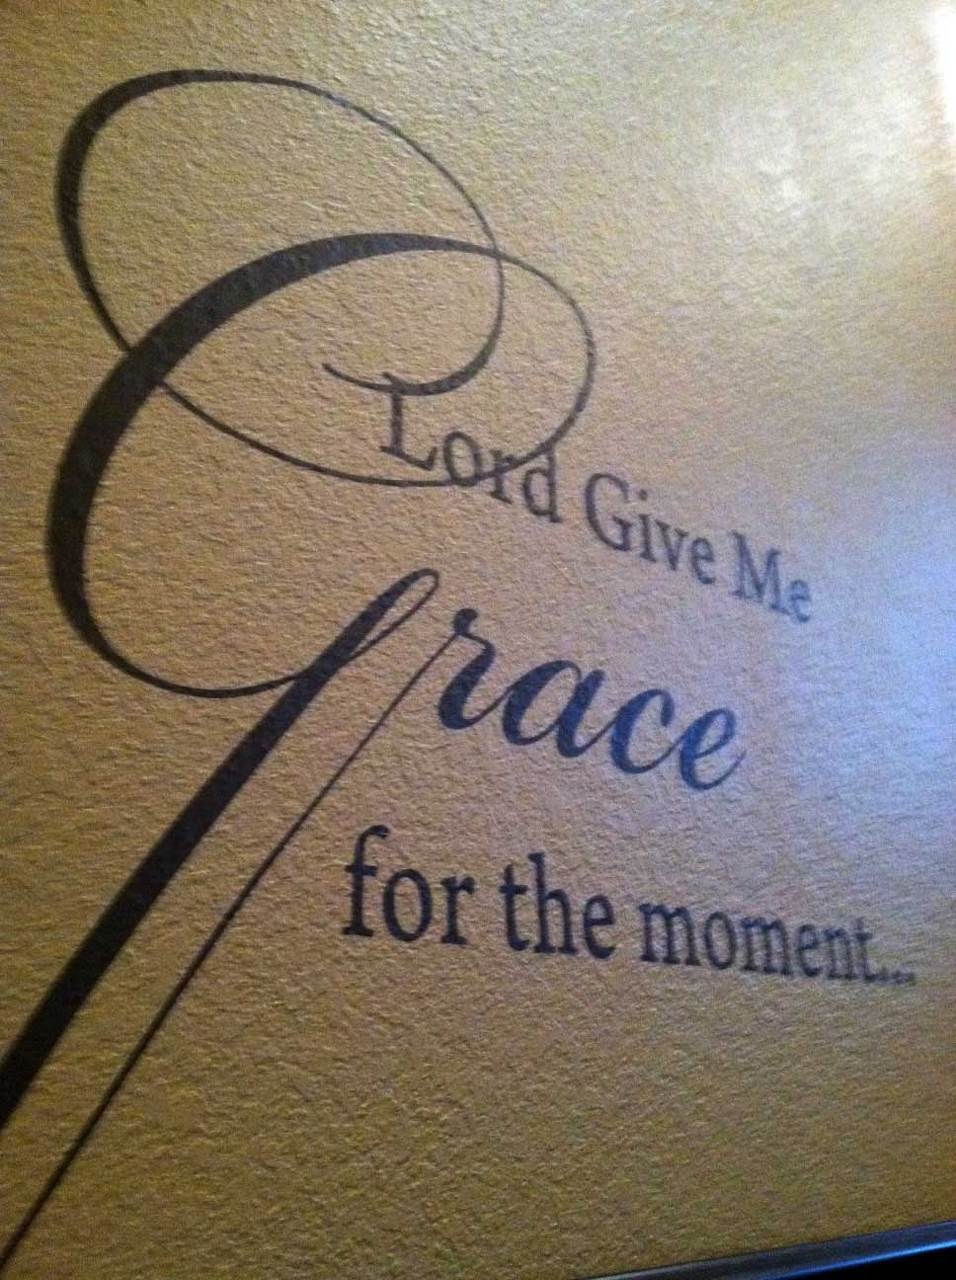 wall praise  bible verse wall decals  christian wall decals  scripture vinyl decals